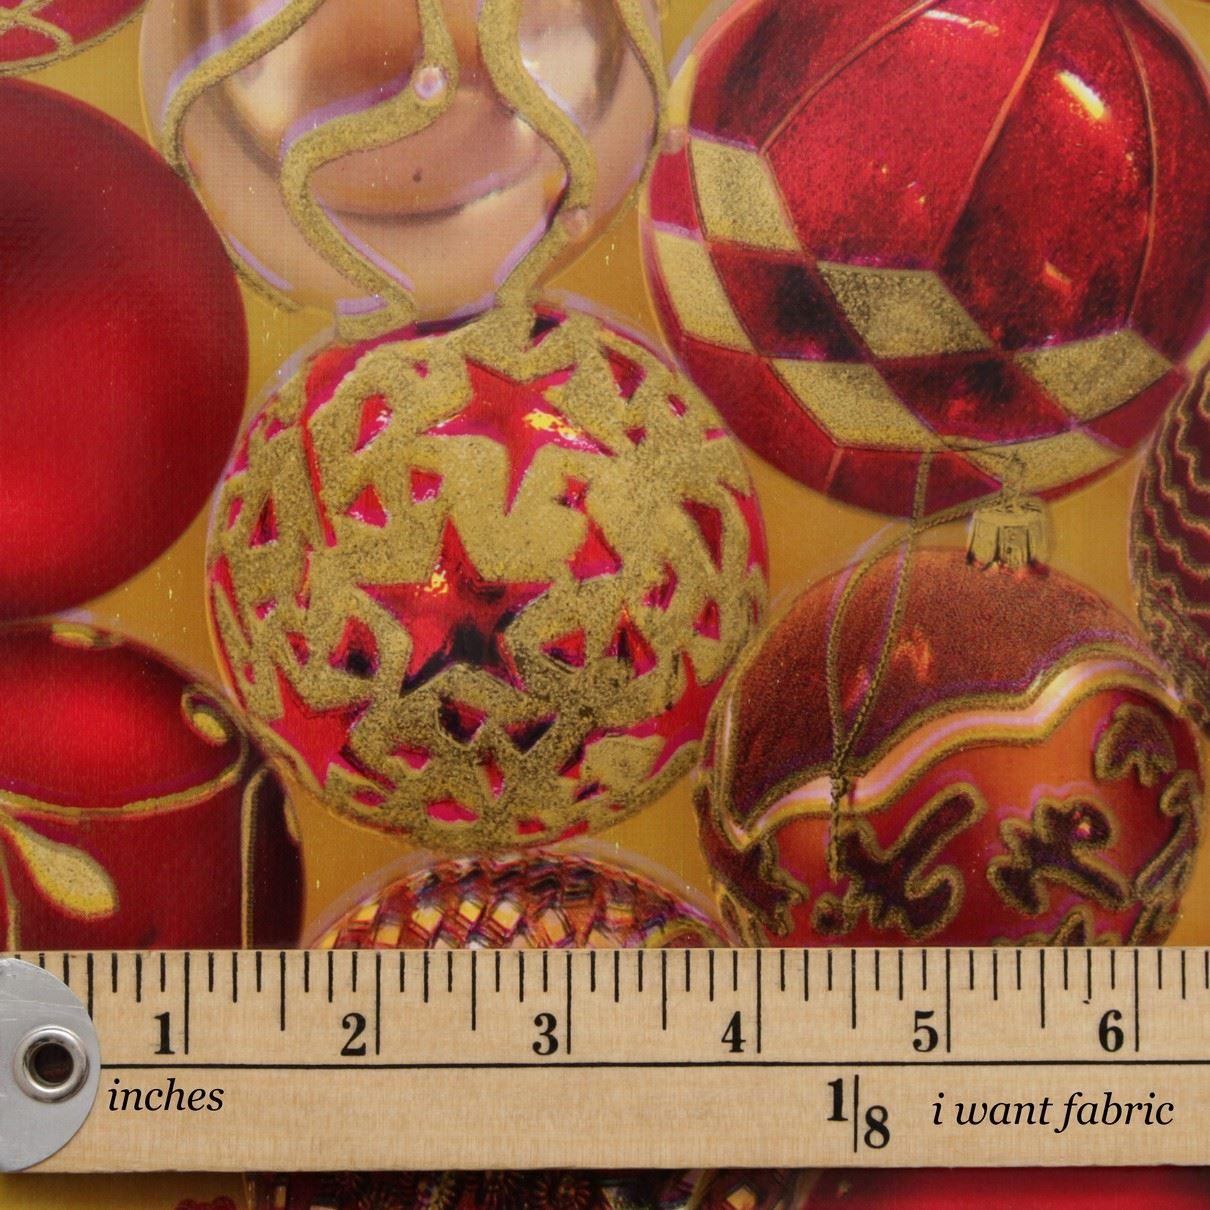 thumbnail 19 - CHRISTMAS PVC OILCLOTH VINYL FABRIC XMAS KITCHEN TABLE WIPECLEAN TABLECLOTHS